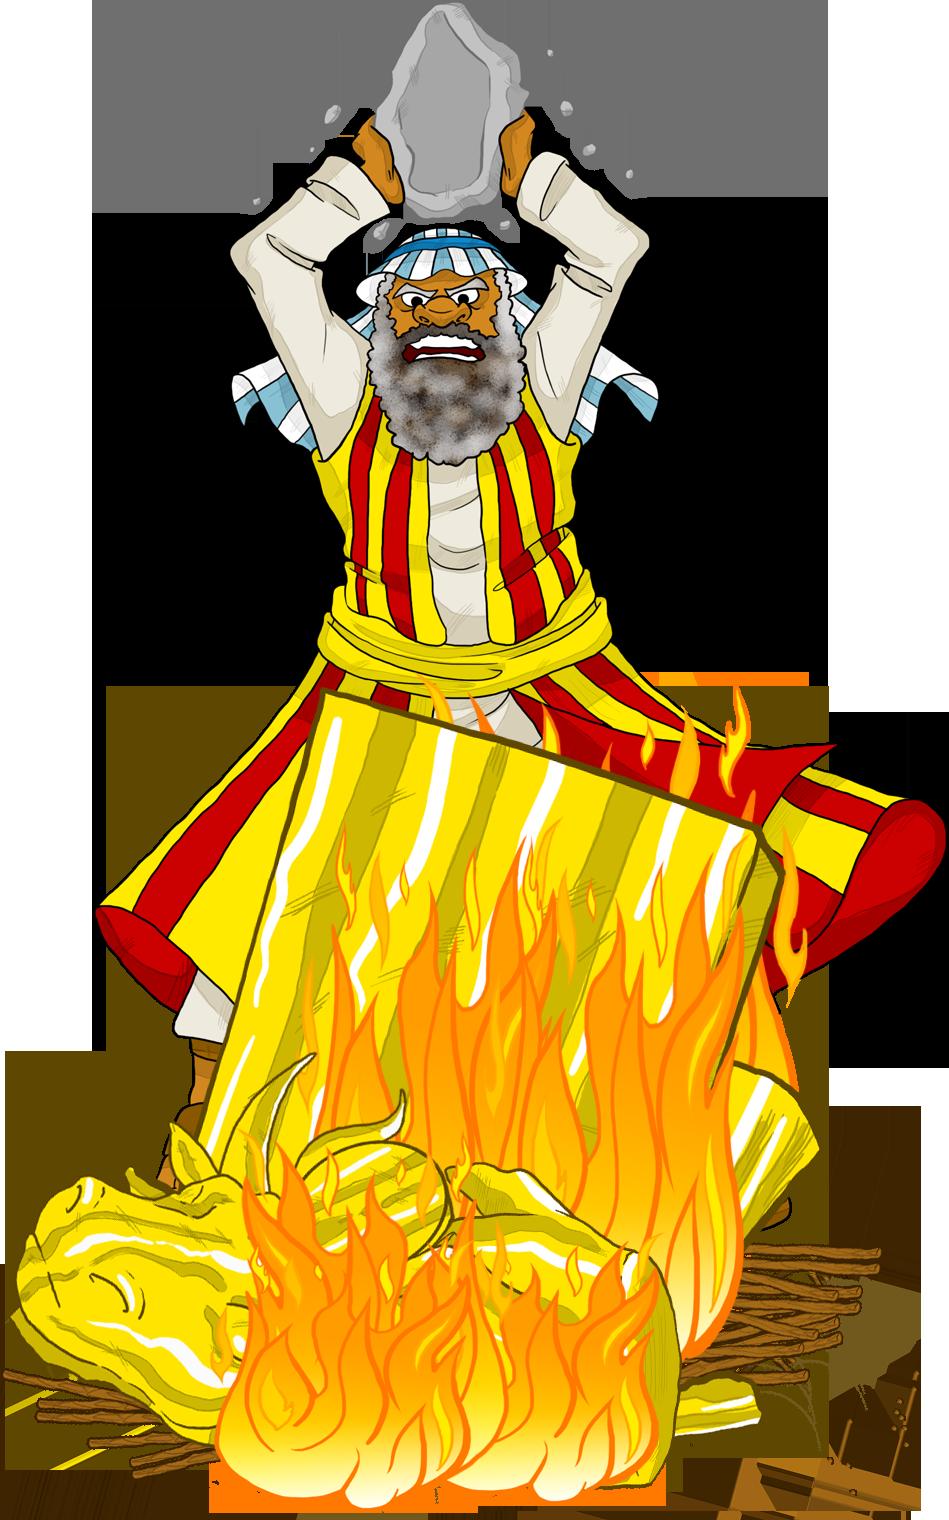 Free coloring page golden calf - Moses Destroys The Golden Calf